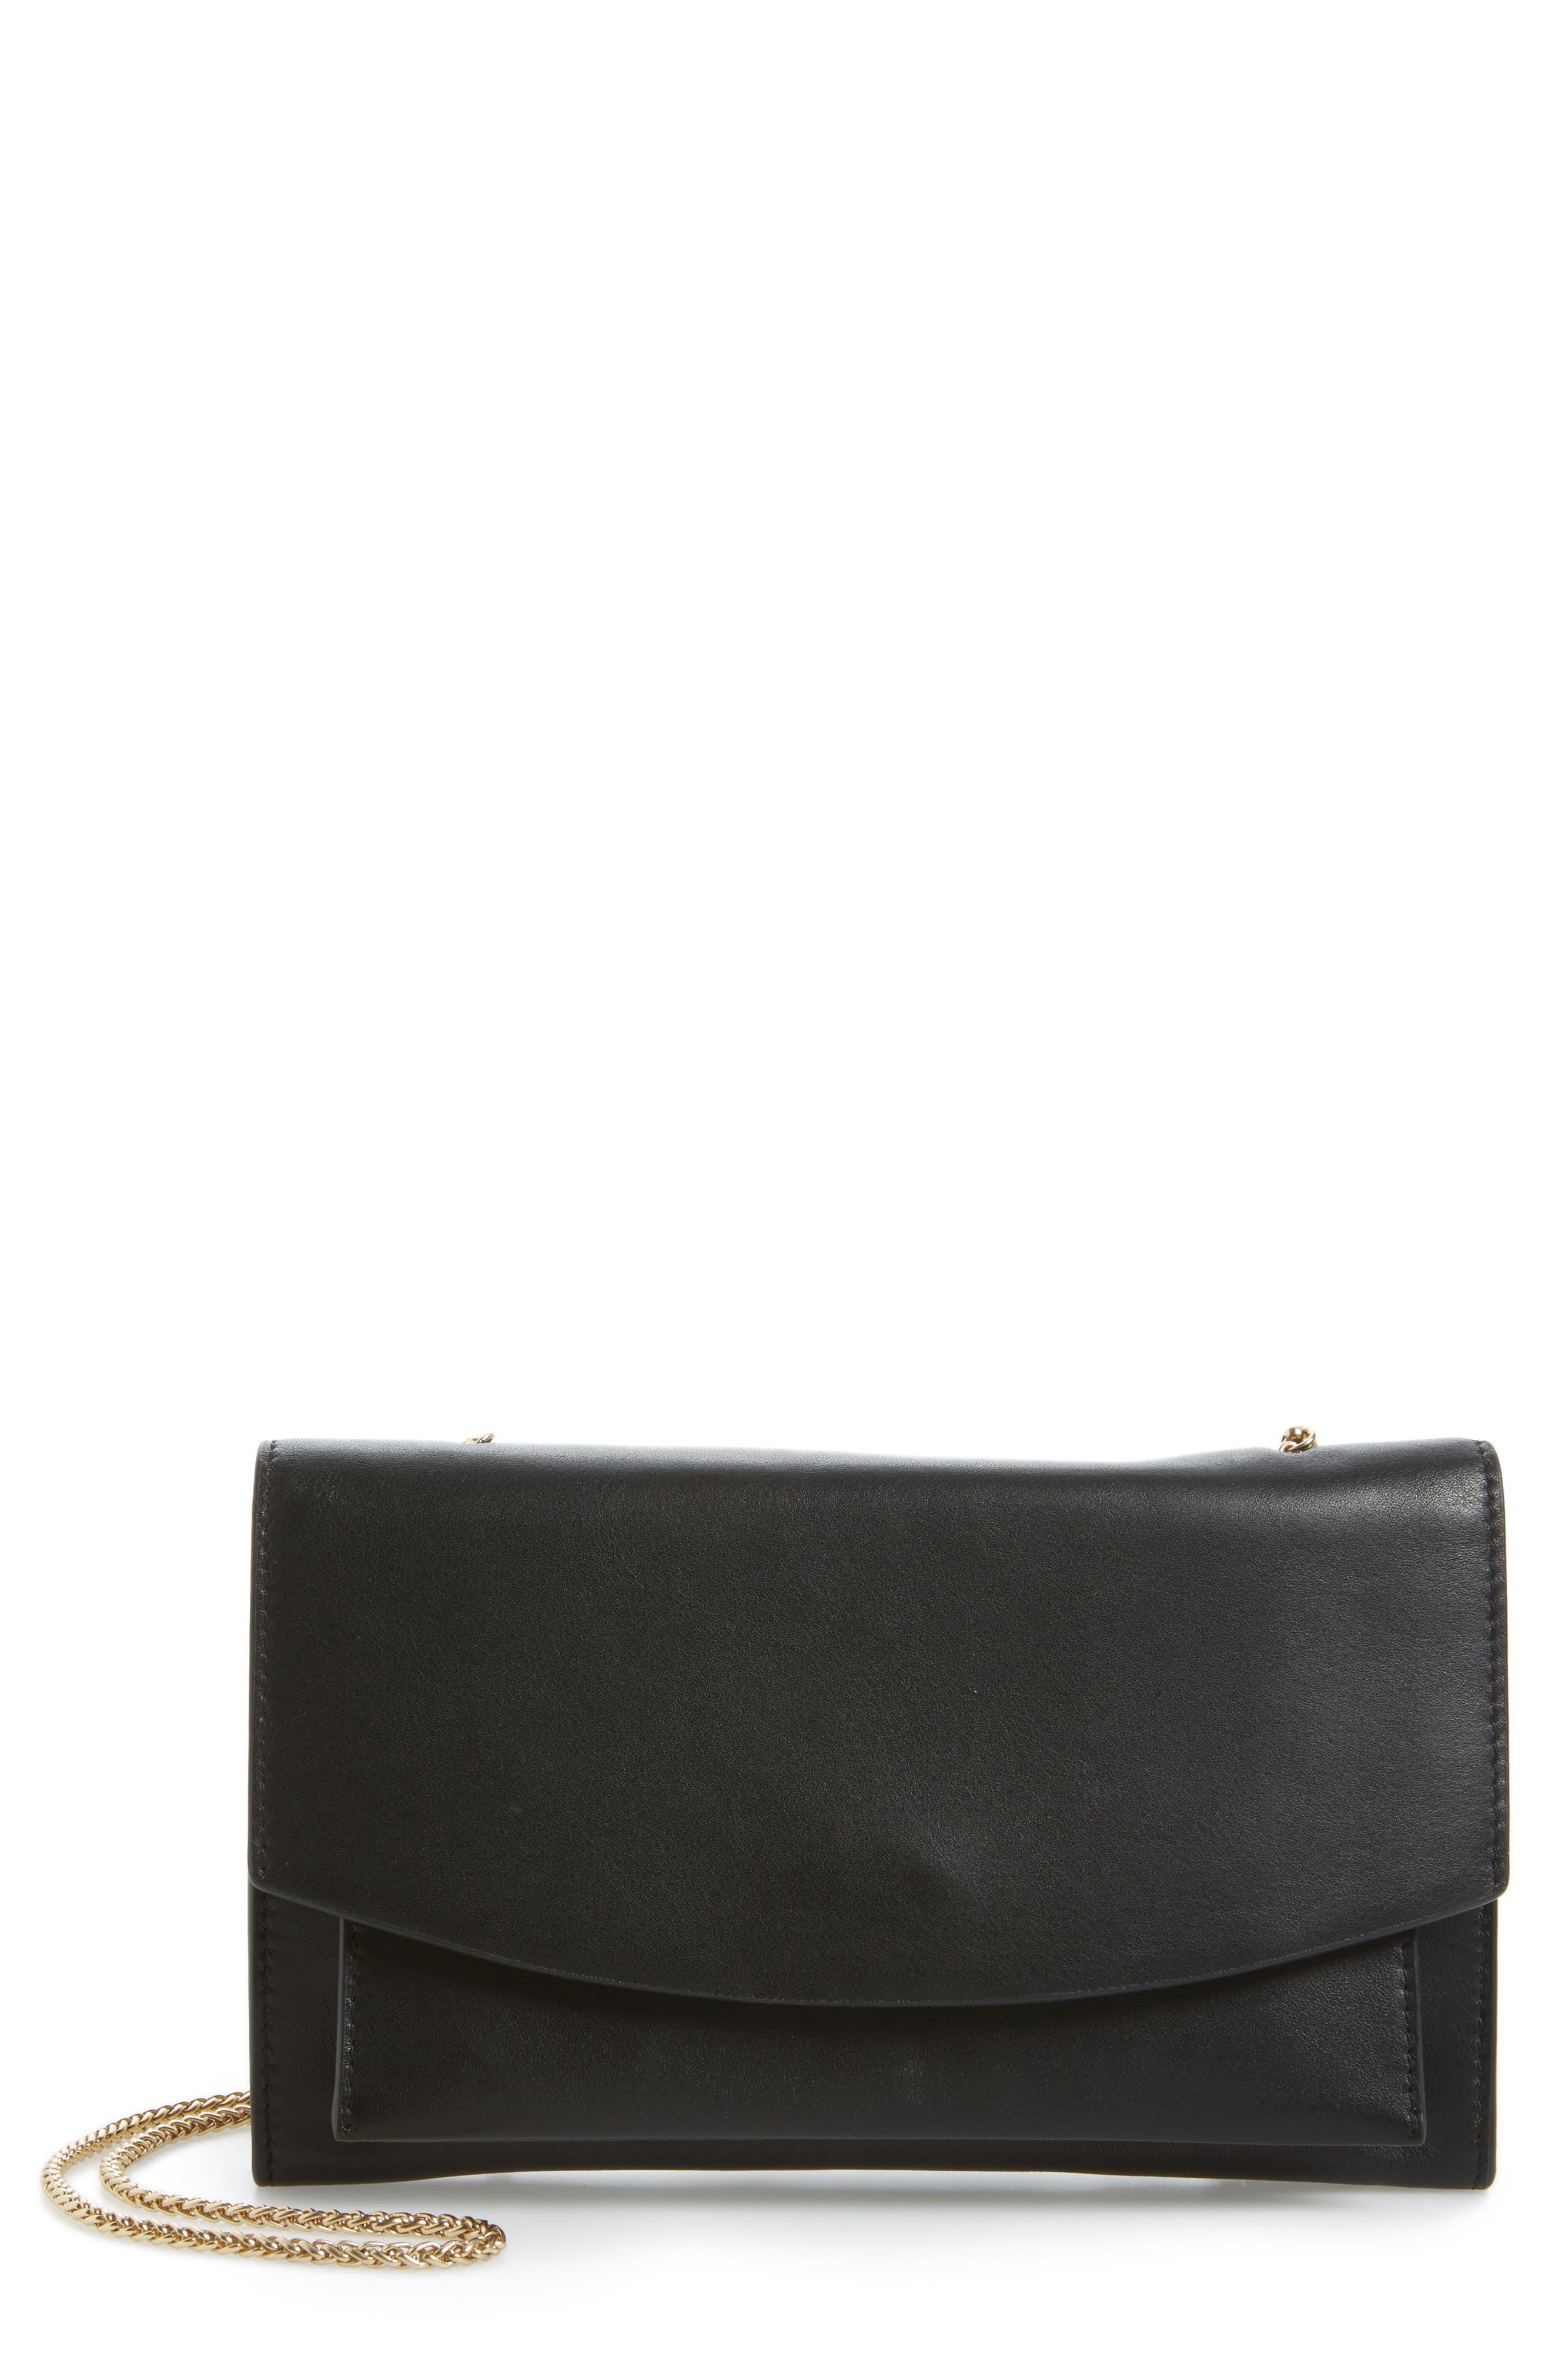 Skagen Eryka Leather Envelope Clutch with Detachable Chain